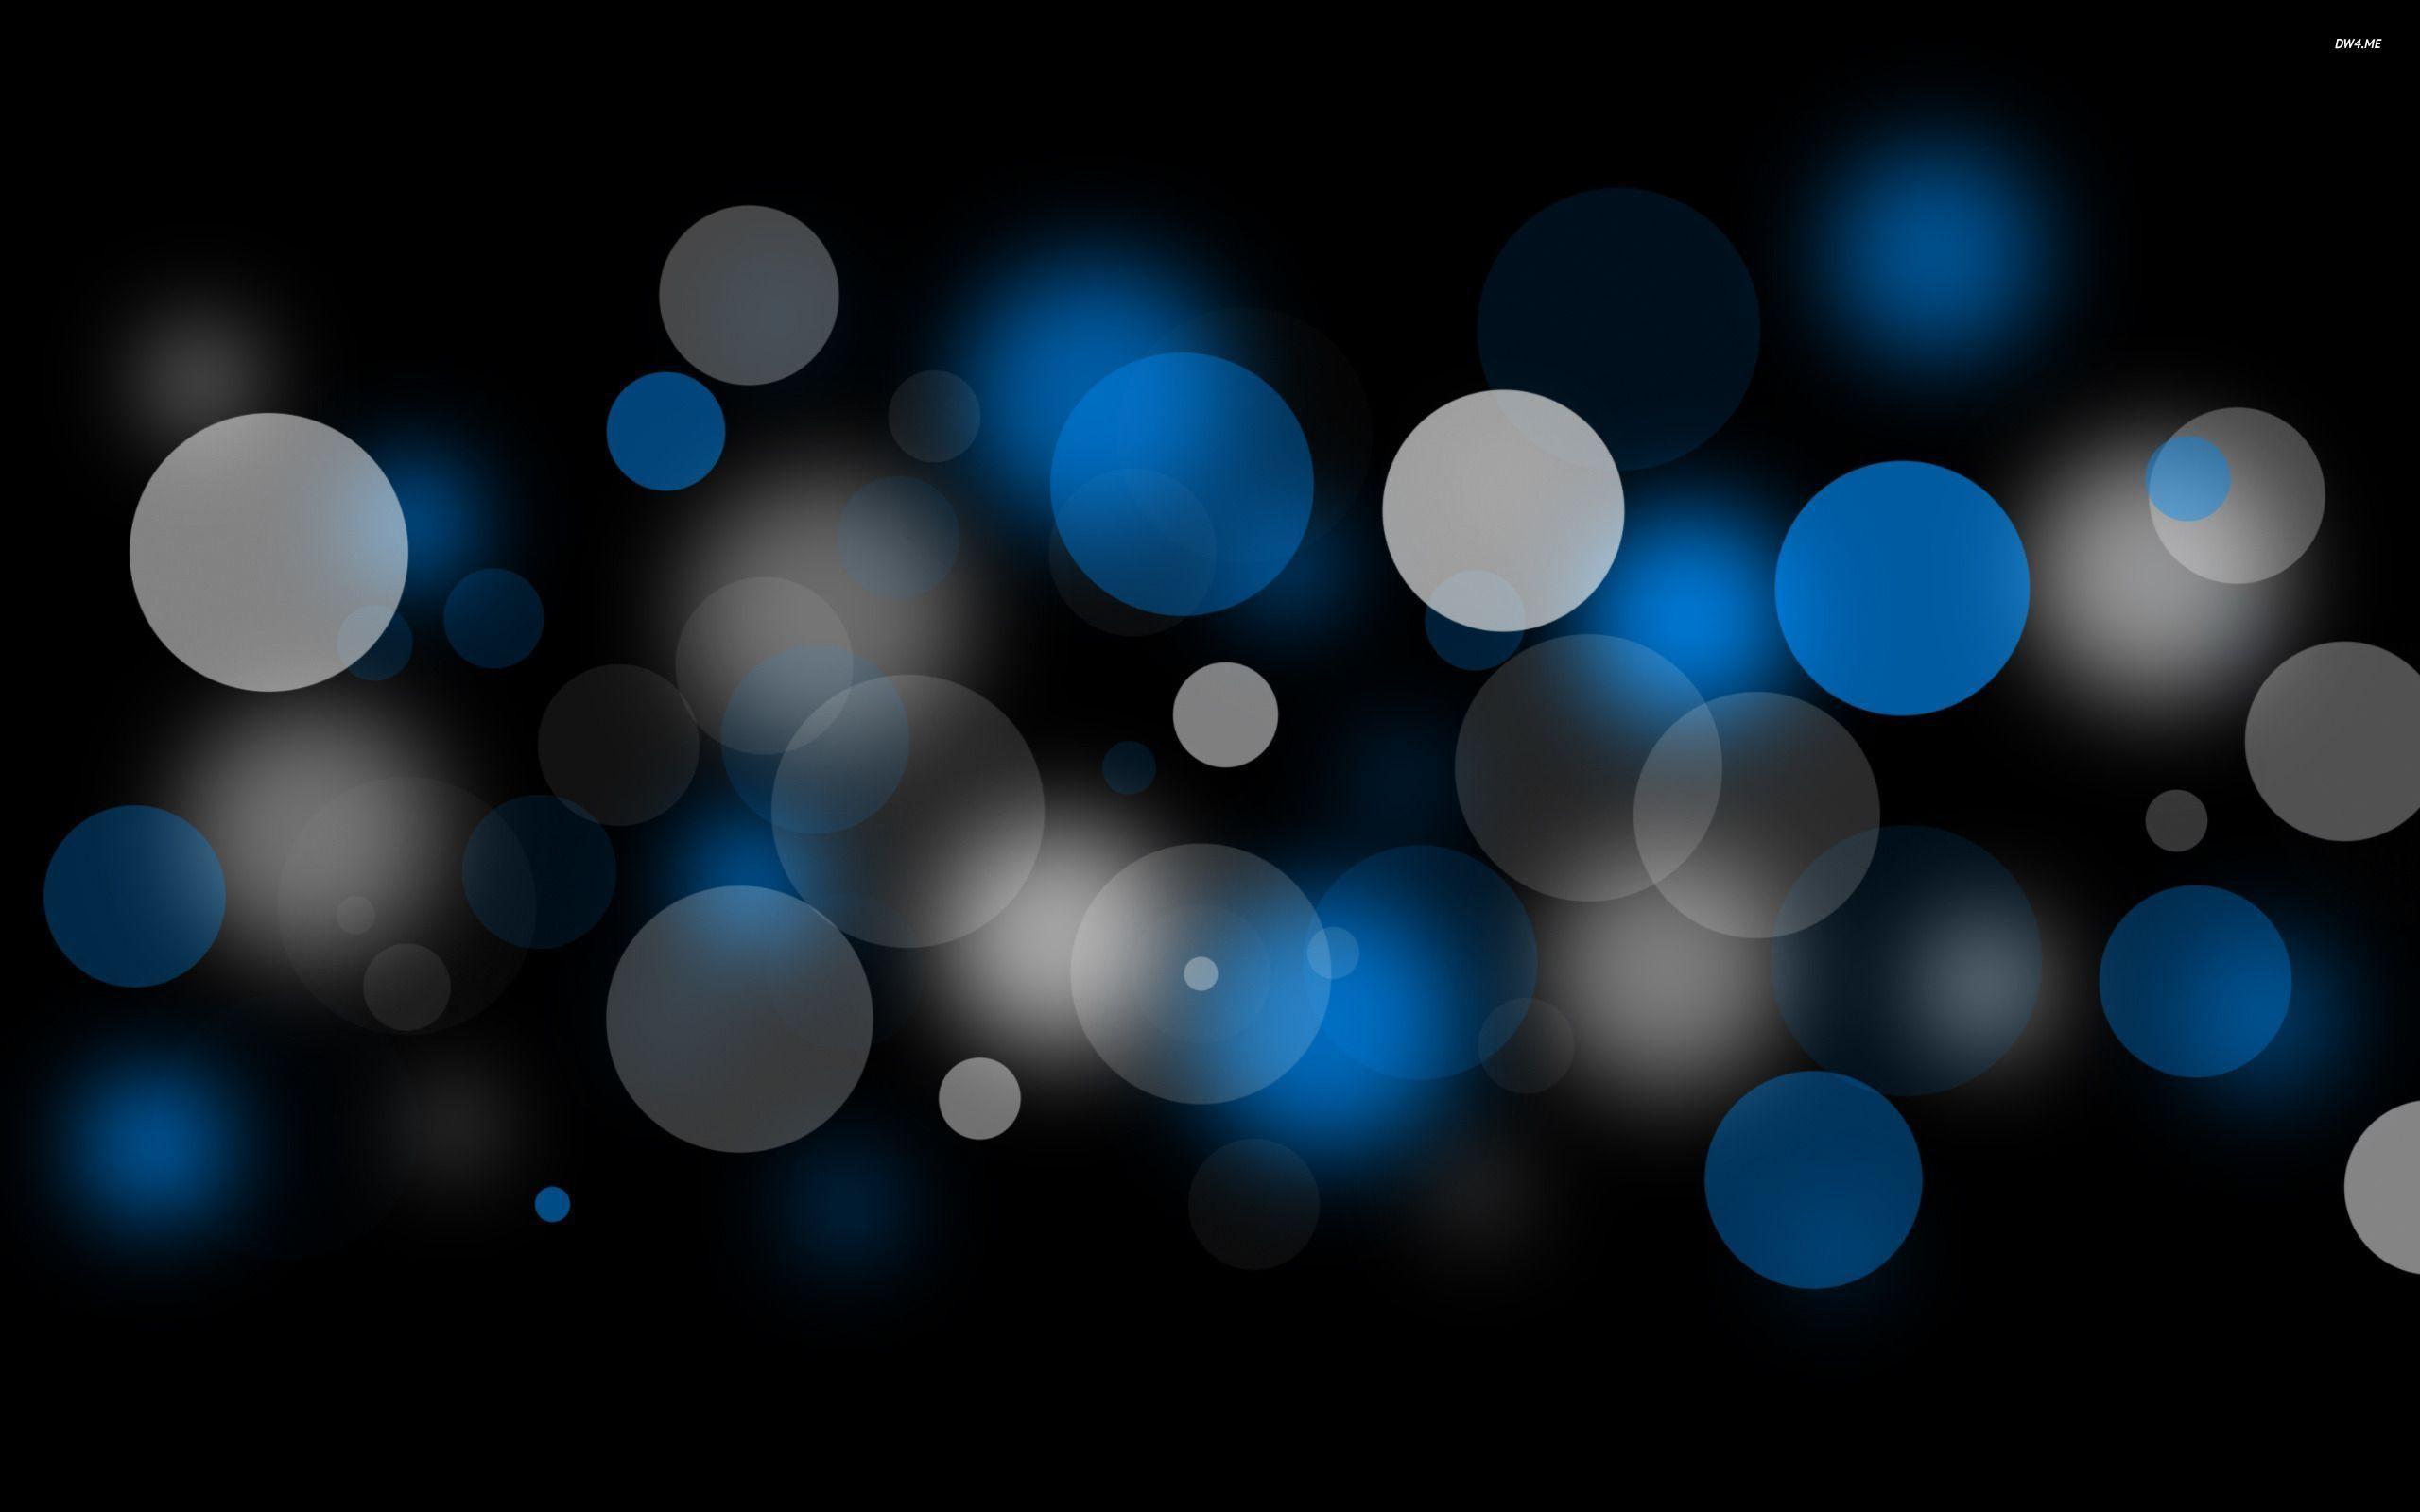 Bubble Desktop Wallpapers Backgrounds Images FreeCreatives 2560×1600